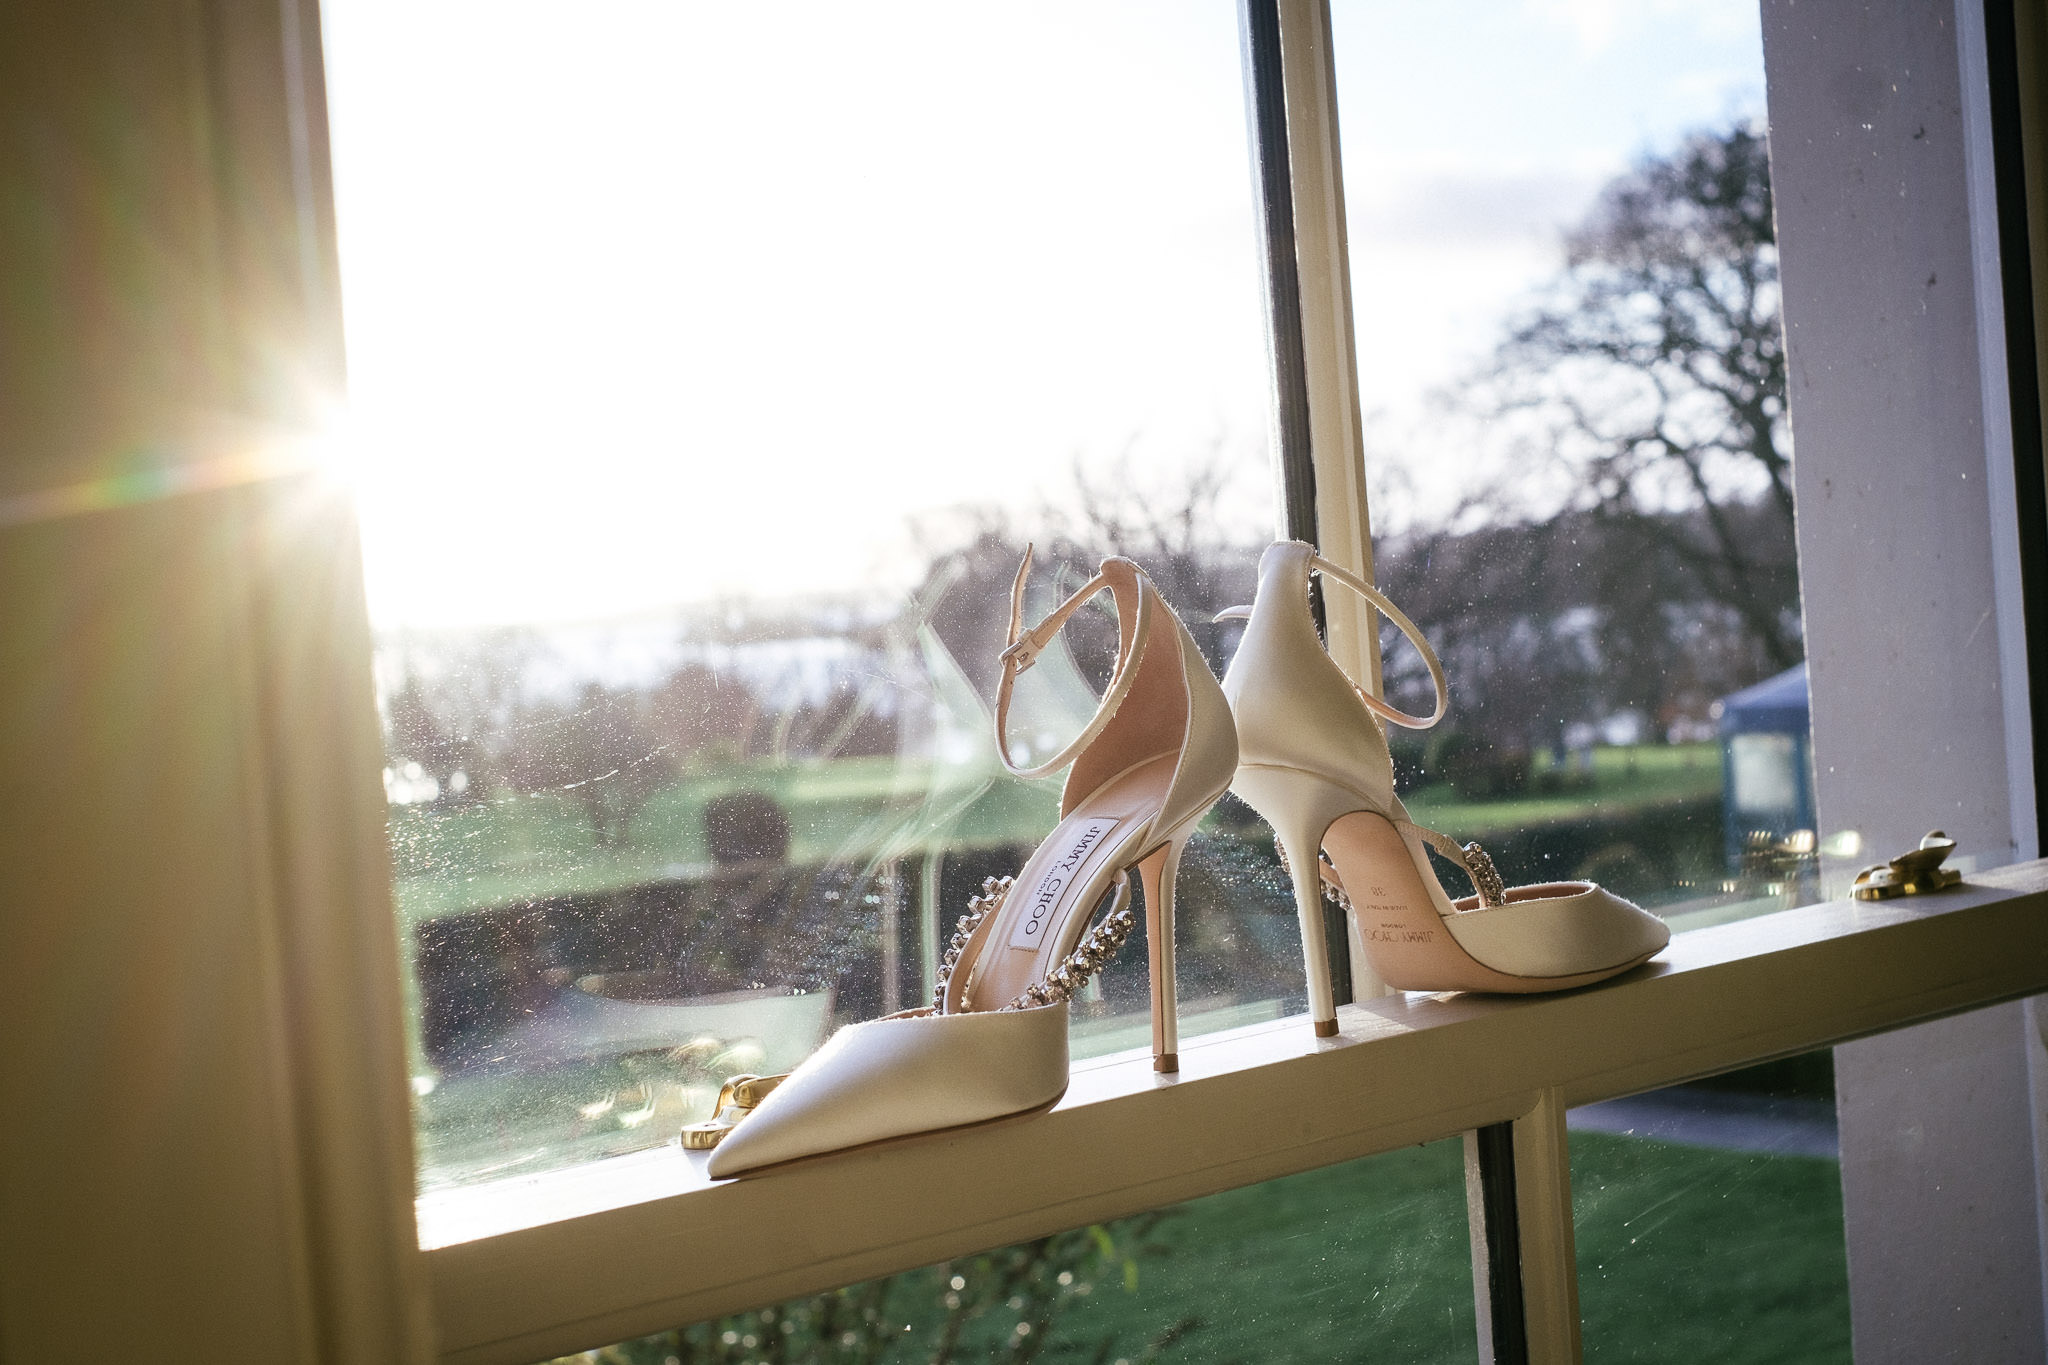 jimmy choo shoes at virginia park lodge wedding